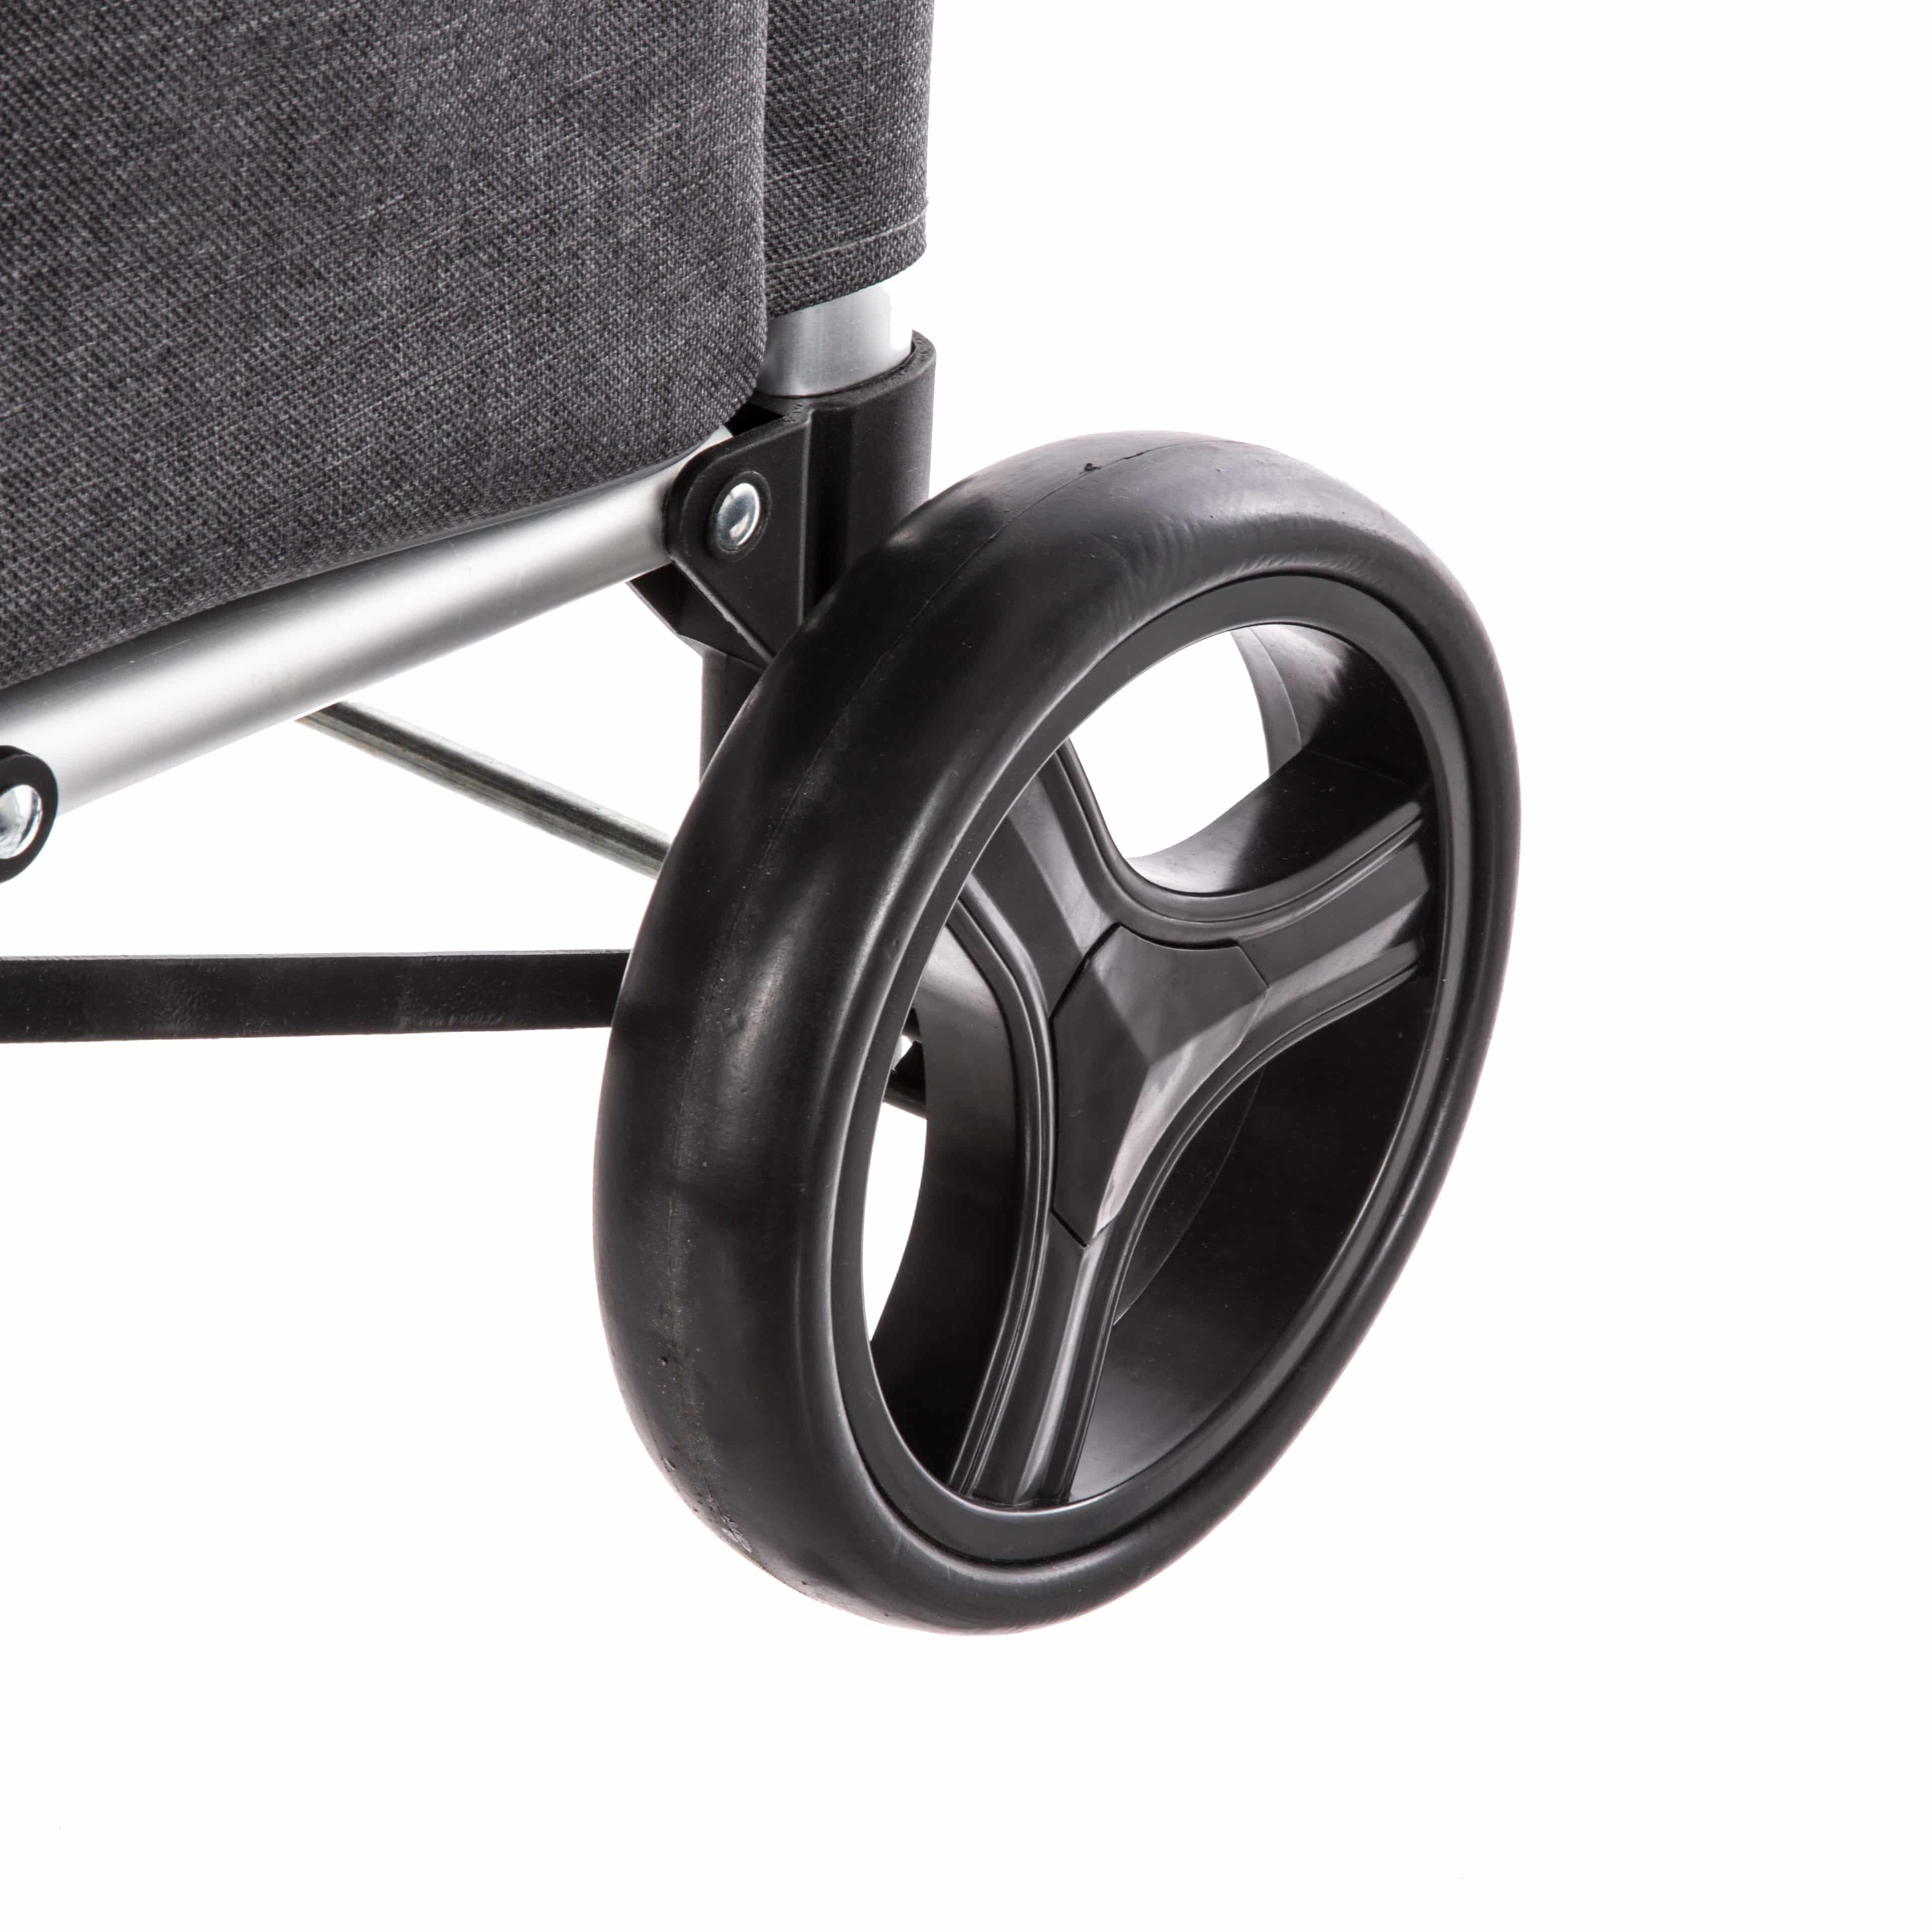 4Goodz Boodschappentrolley Lichtgewicht met grote wielen - 50 liter - Grijs